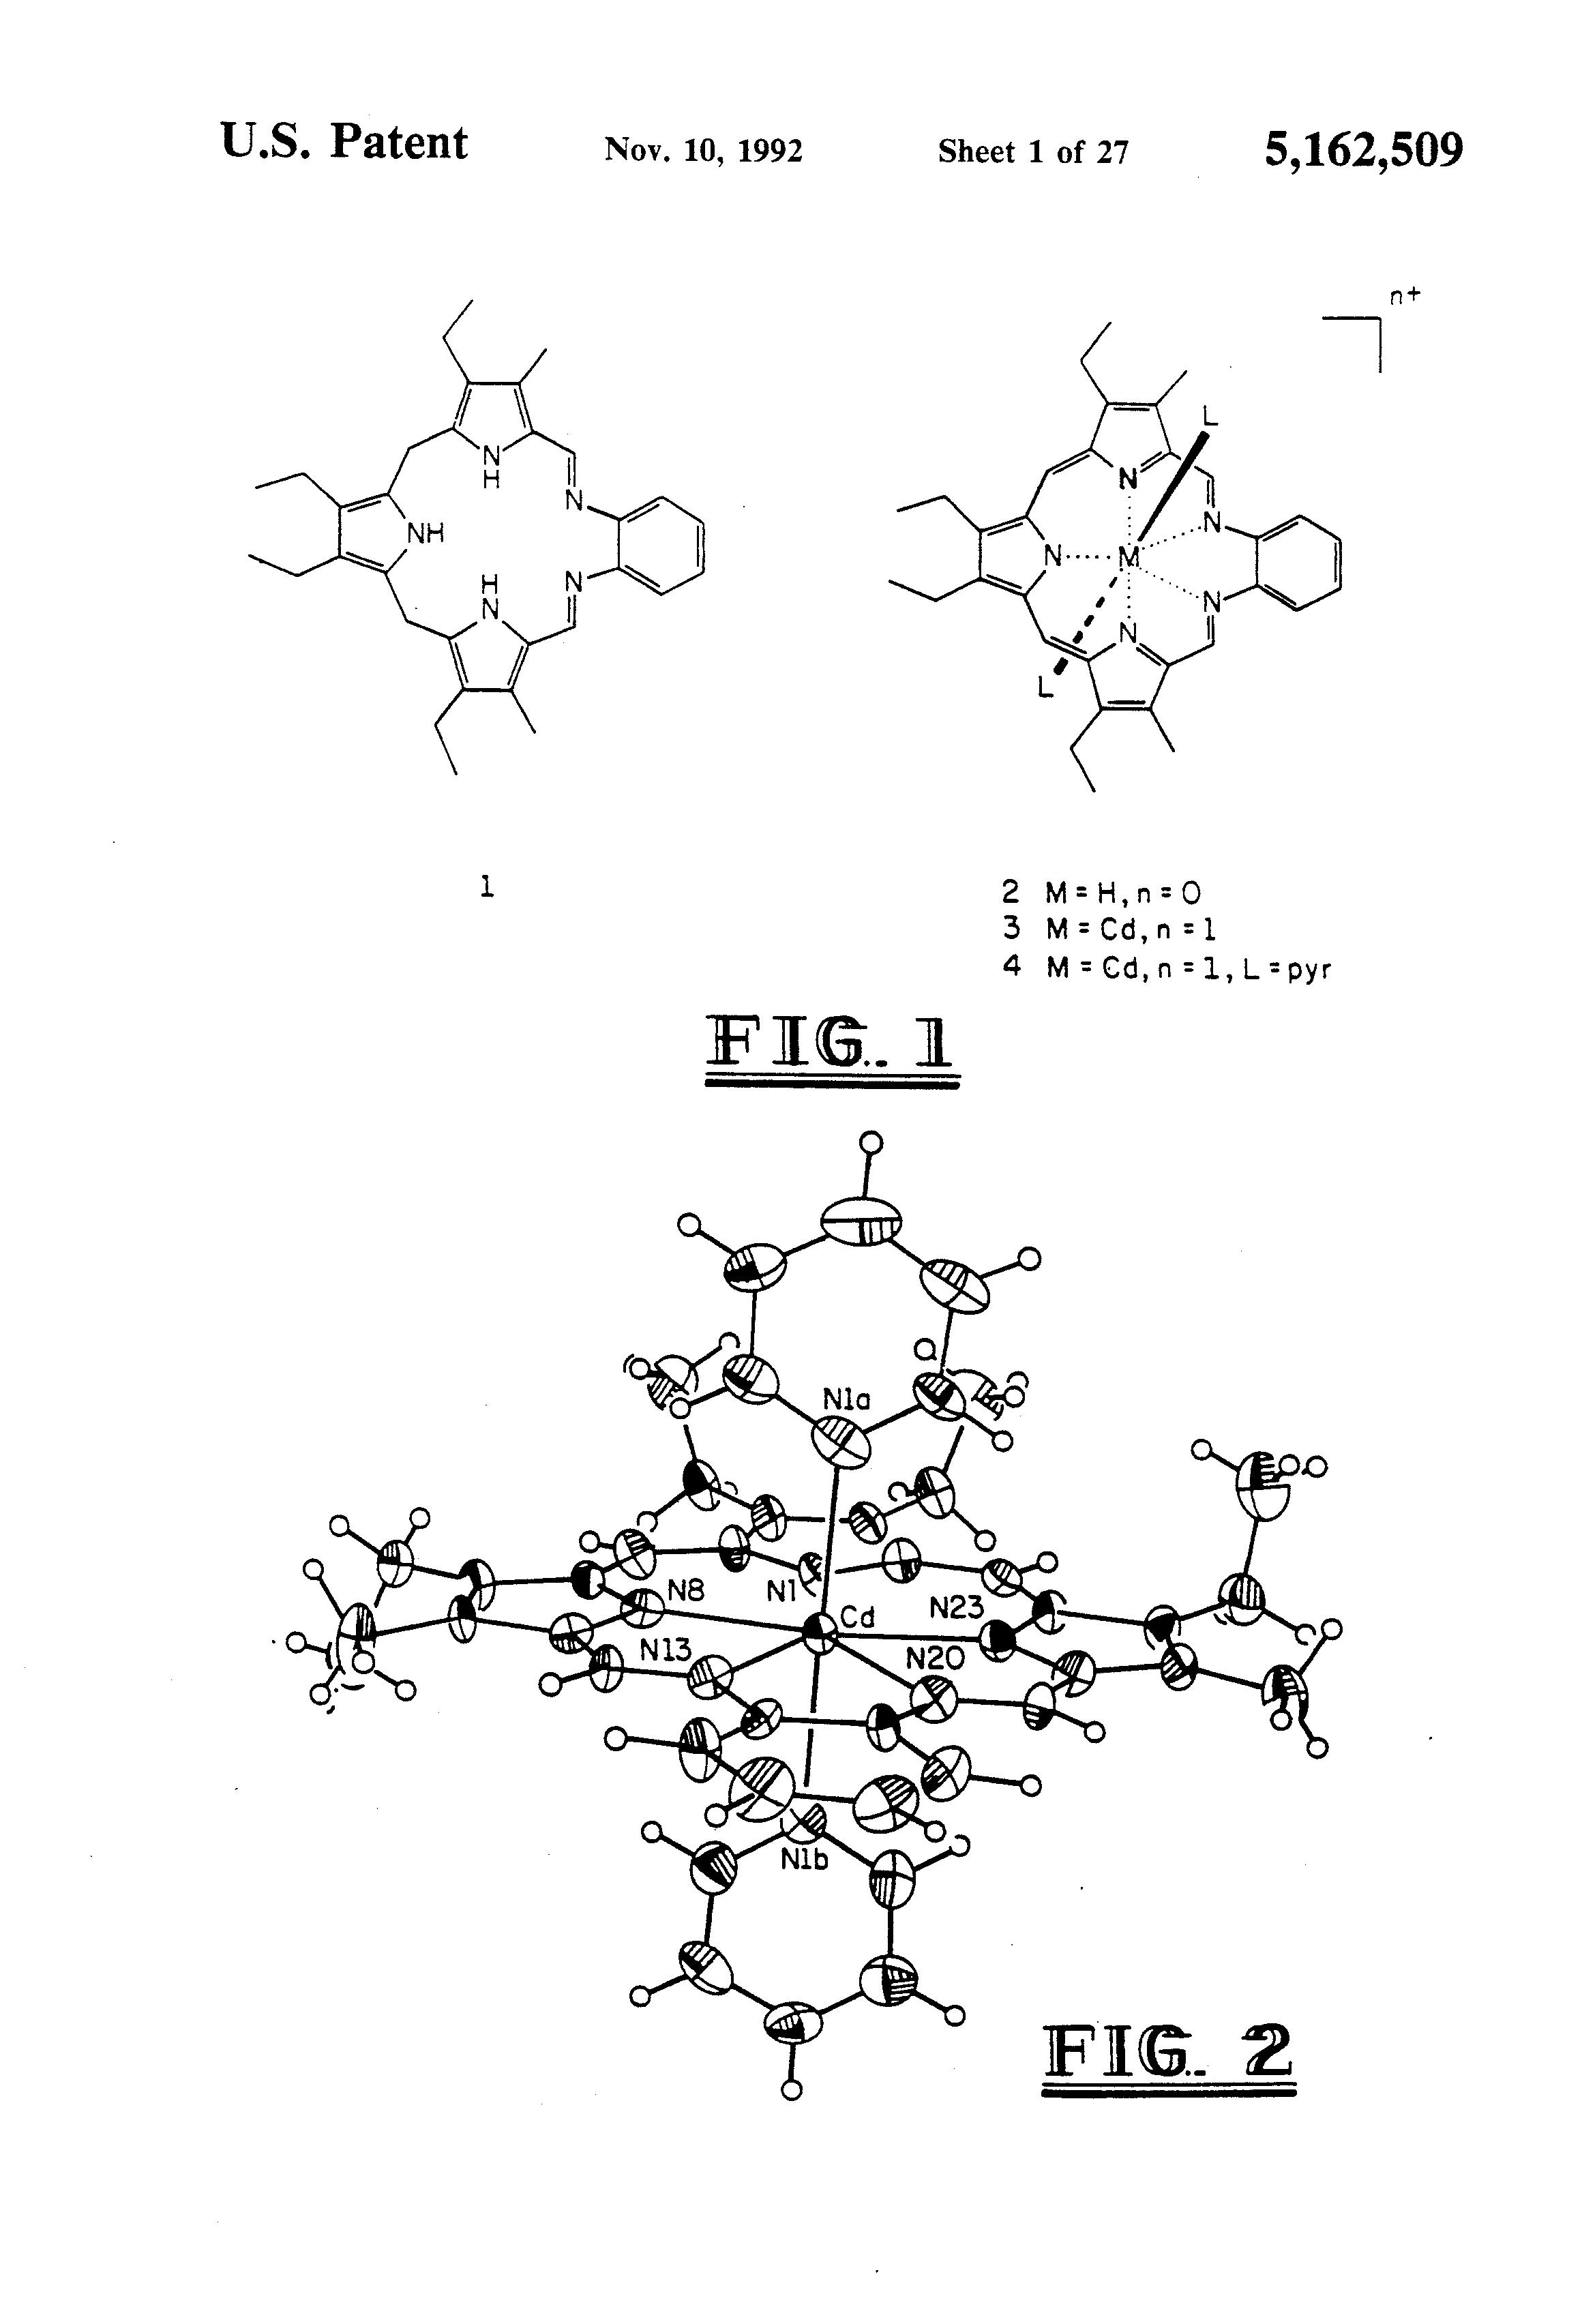 orbital diagram mn wiring diagram database Dot Diagram Kinematics patent us5162509 process for preparing expanded porphyrins large atomic orbital diagram orbital diagram mn